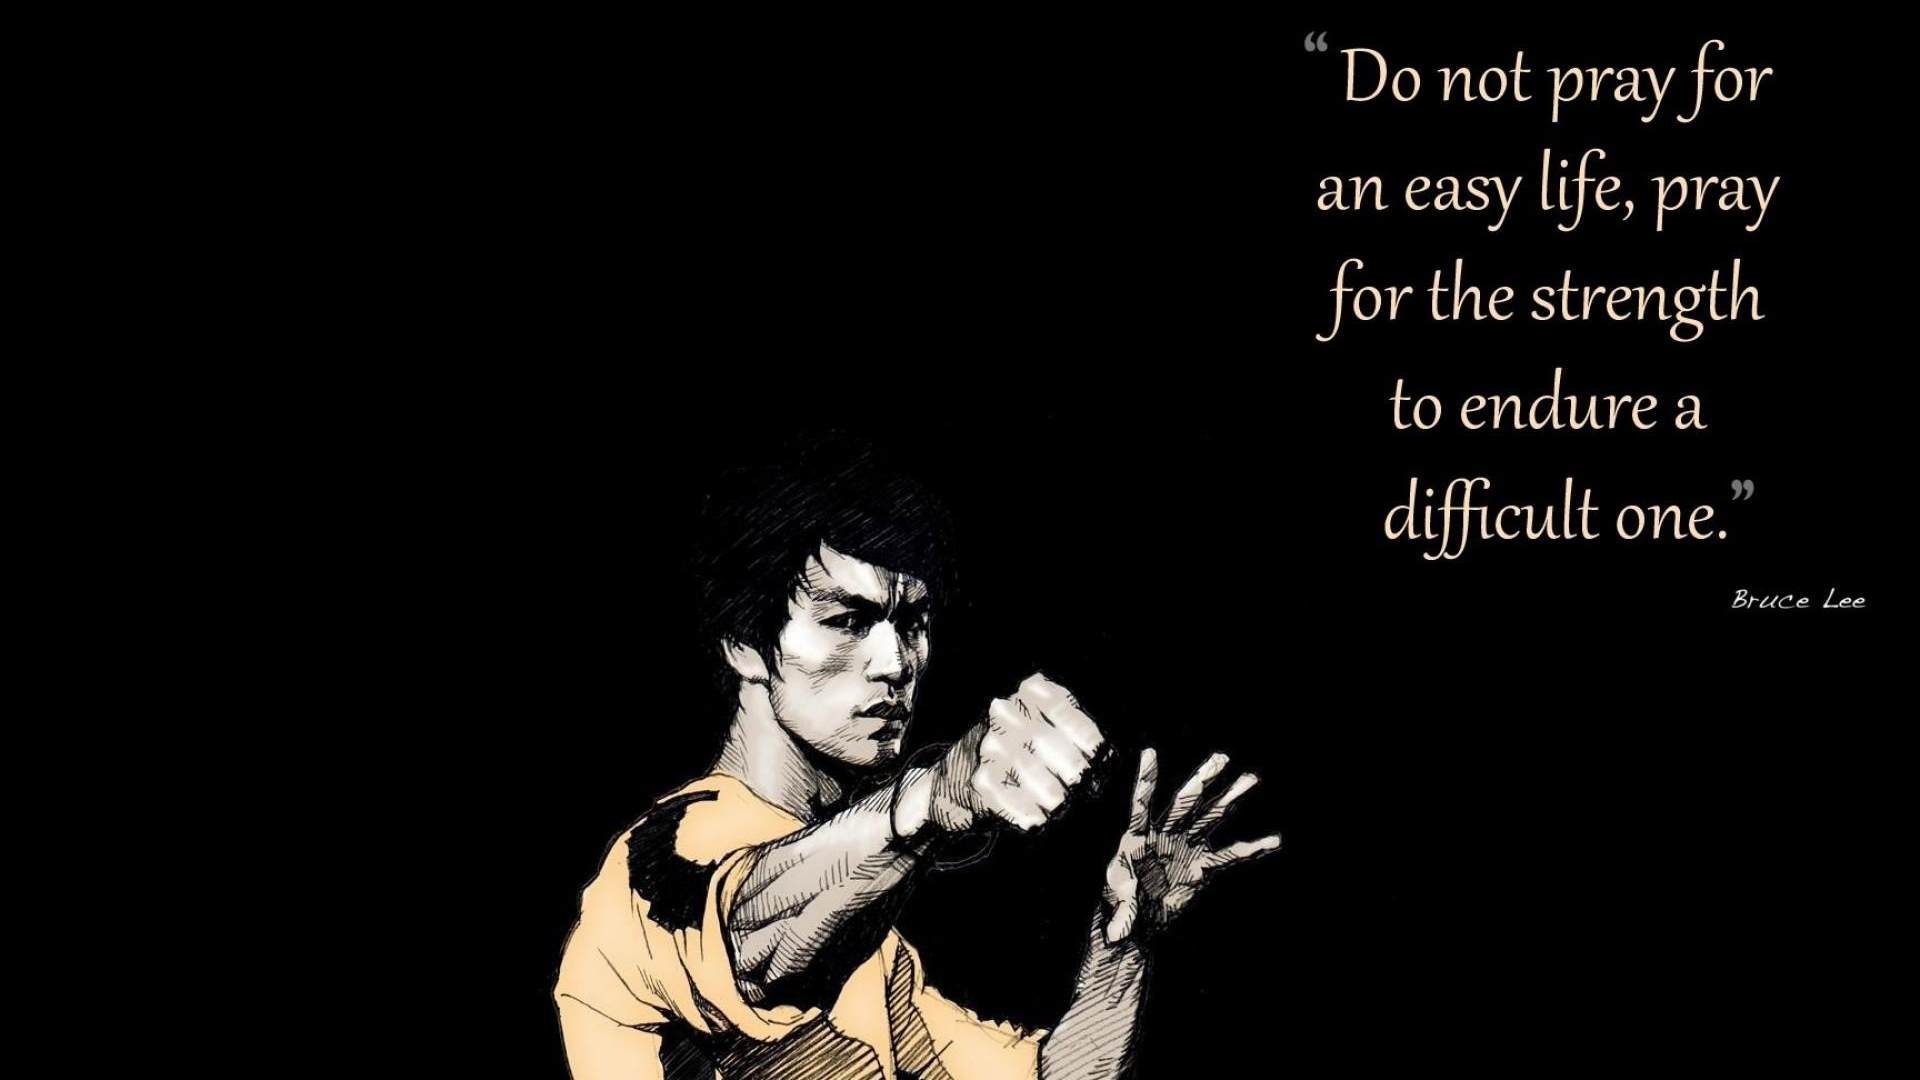 Bruce Lee Quotes Hd - HD Wallpaper